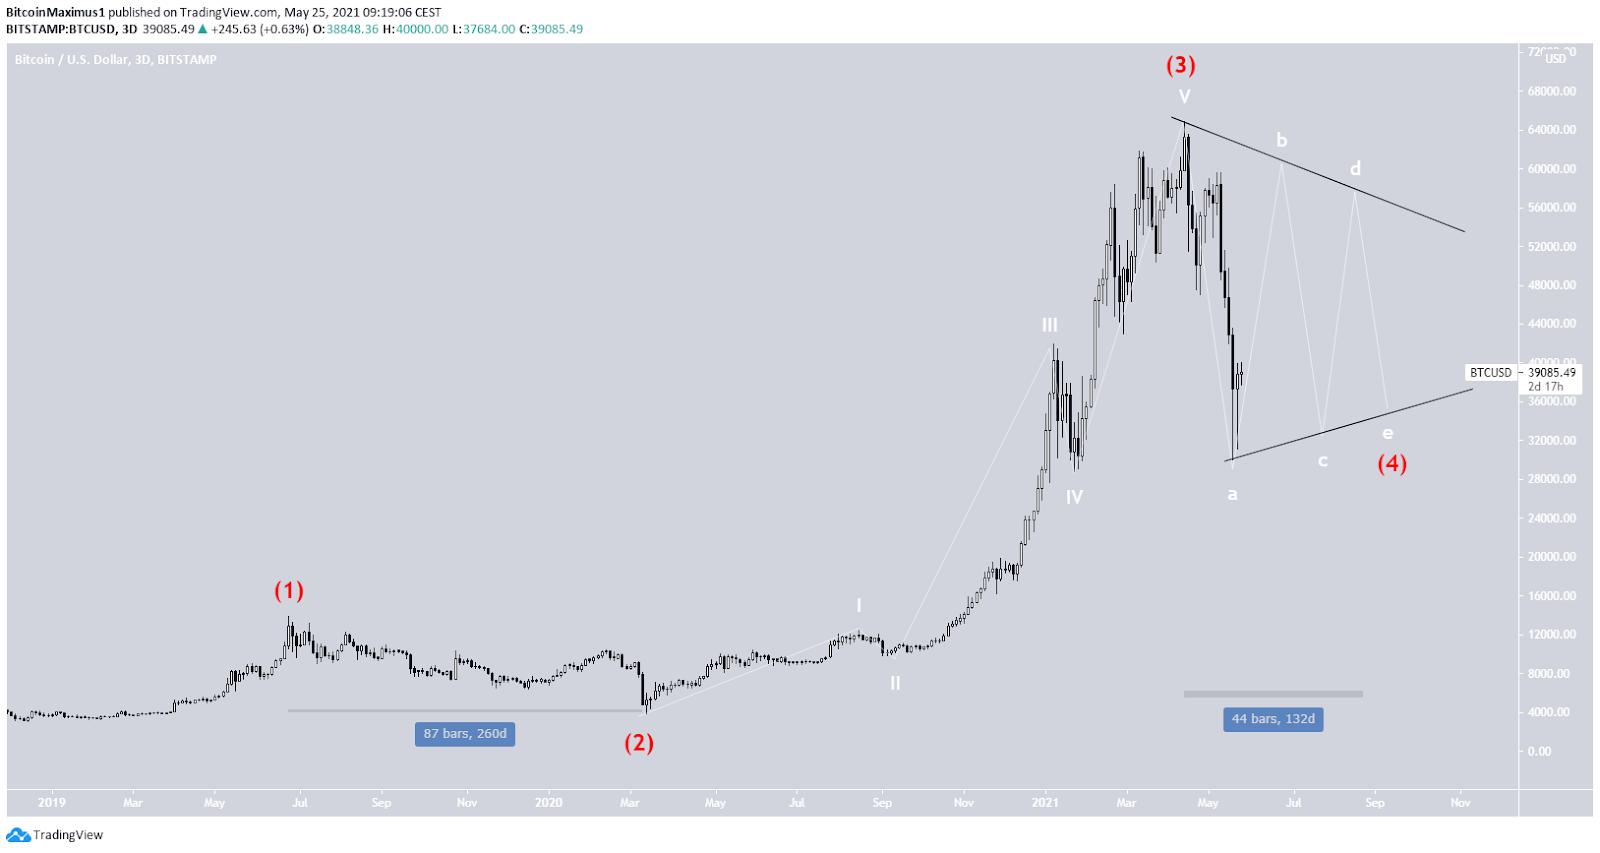 Bitcoin Preis Kurs Wellenanalyse 25.05.2021